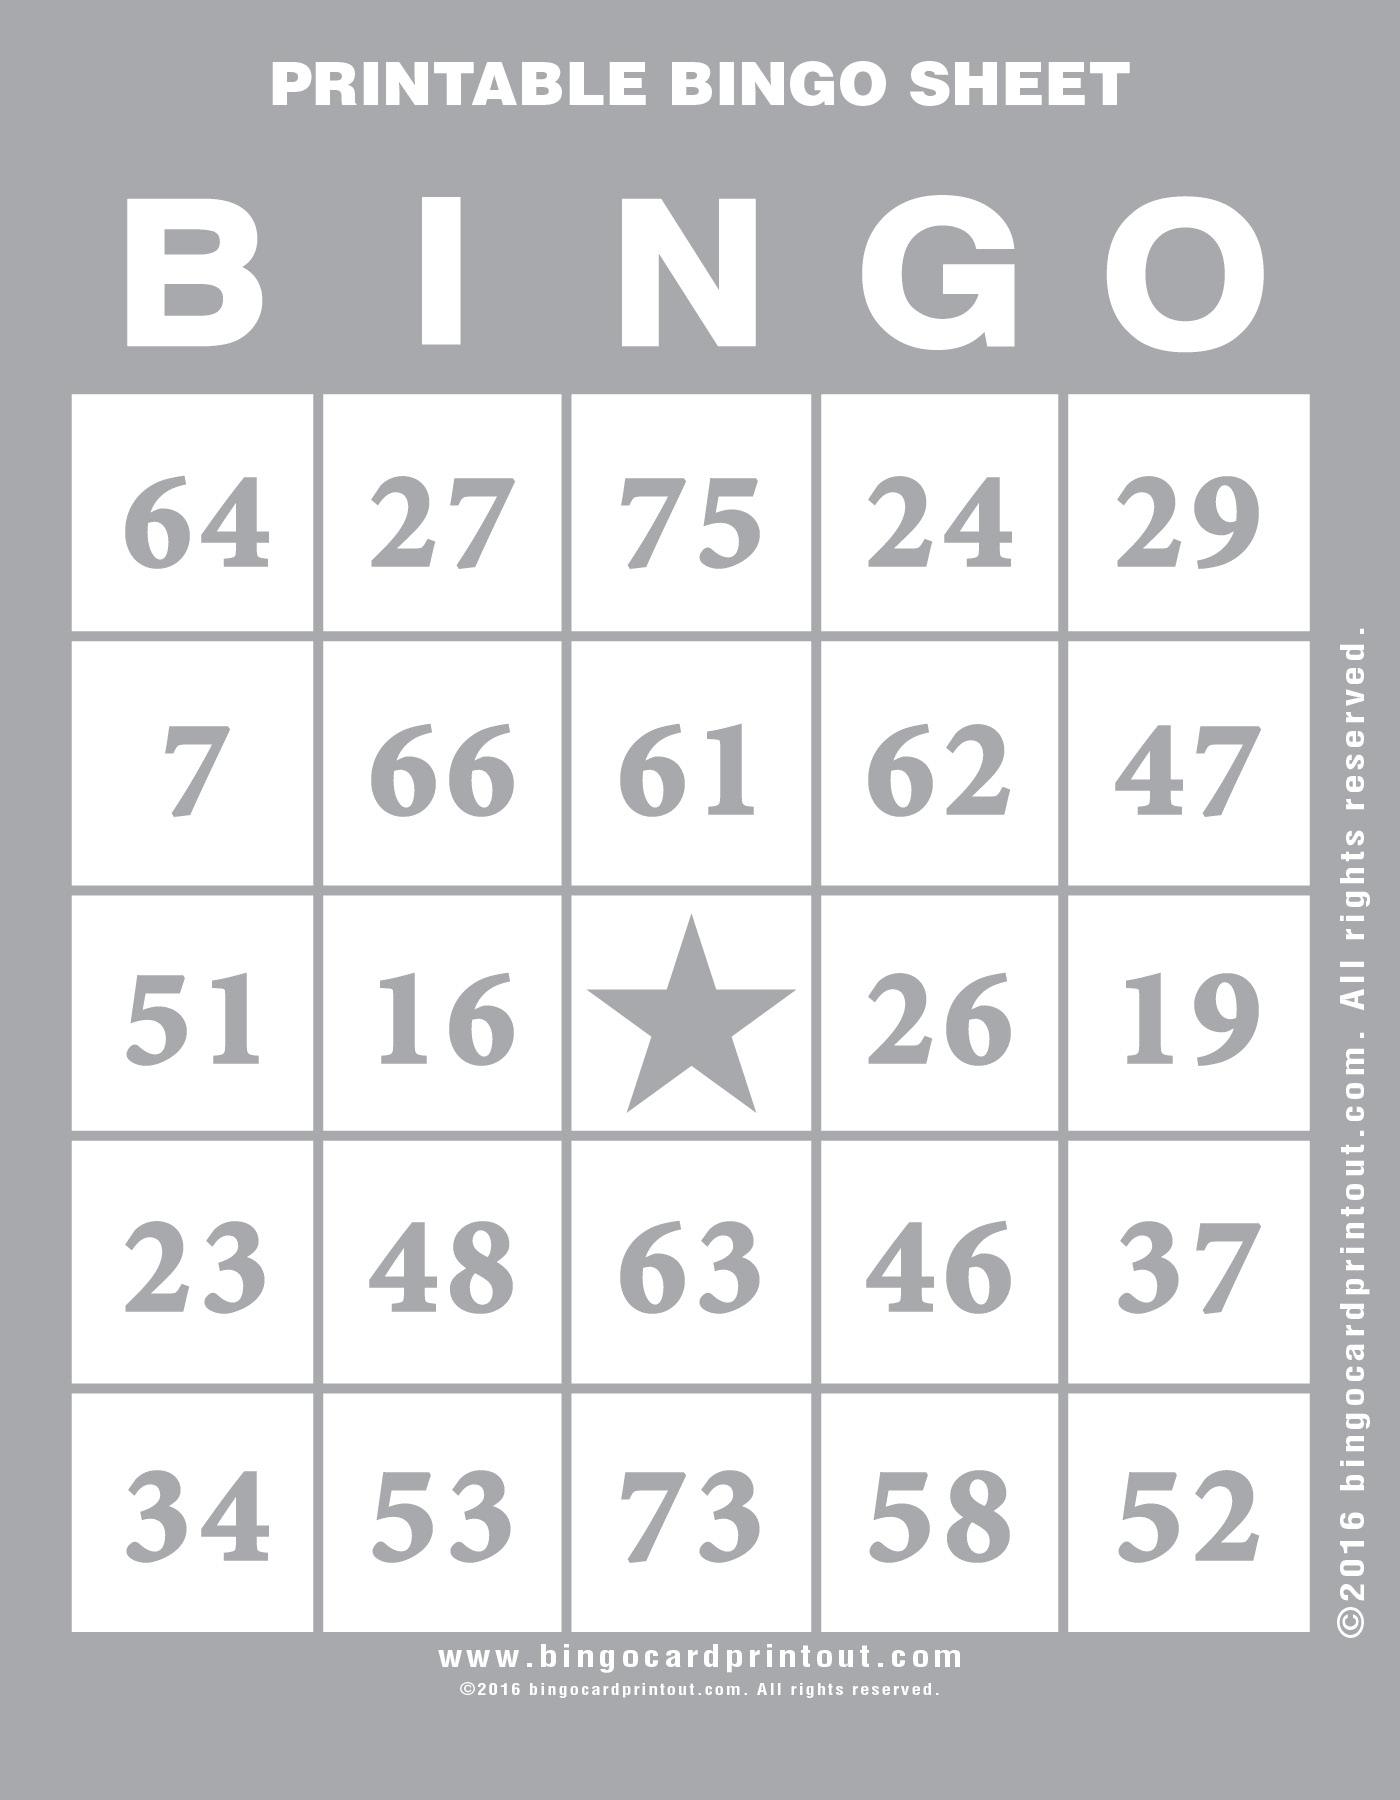 Printable Bingo Sheet Bingocardprintout Com